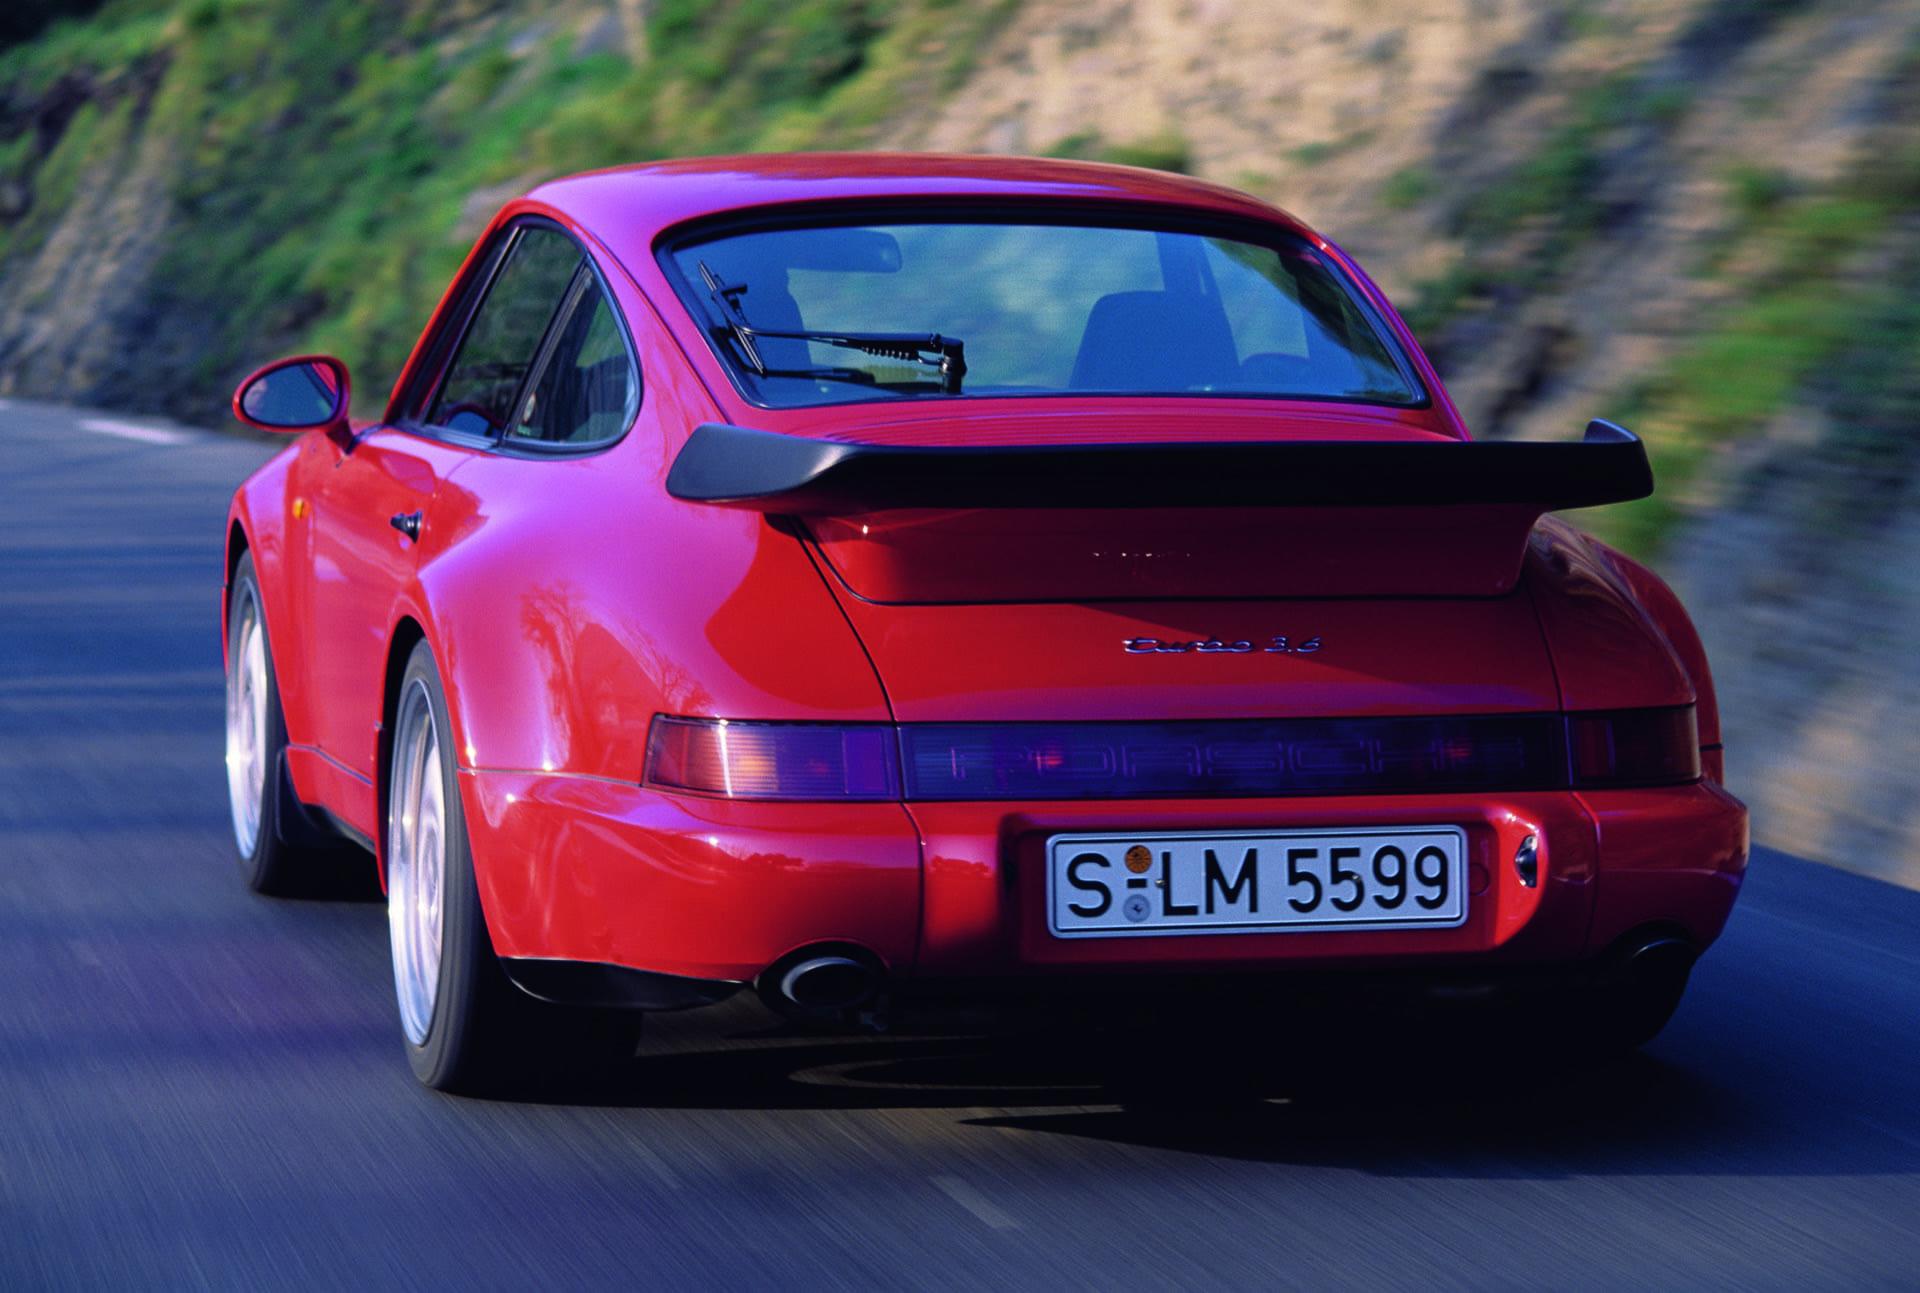 Porsche 911 964 Turbo 3 6 Coupe 1993